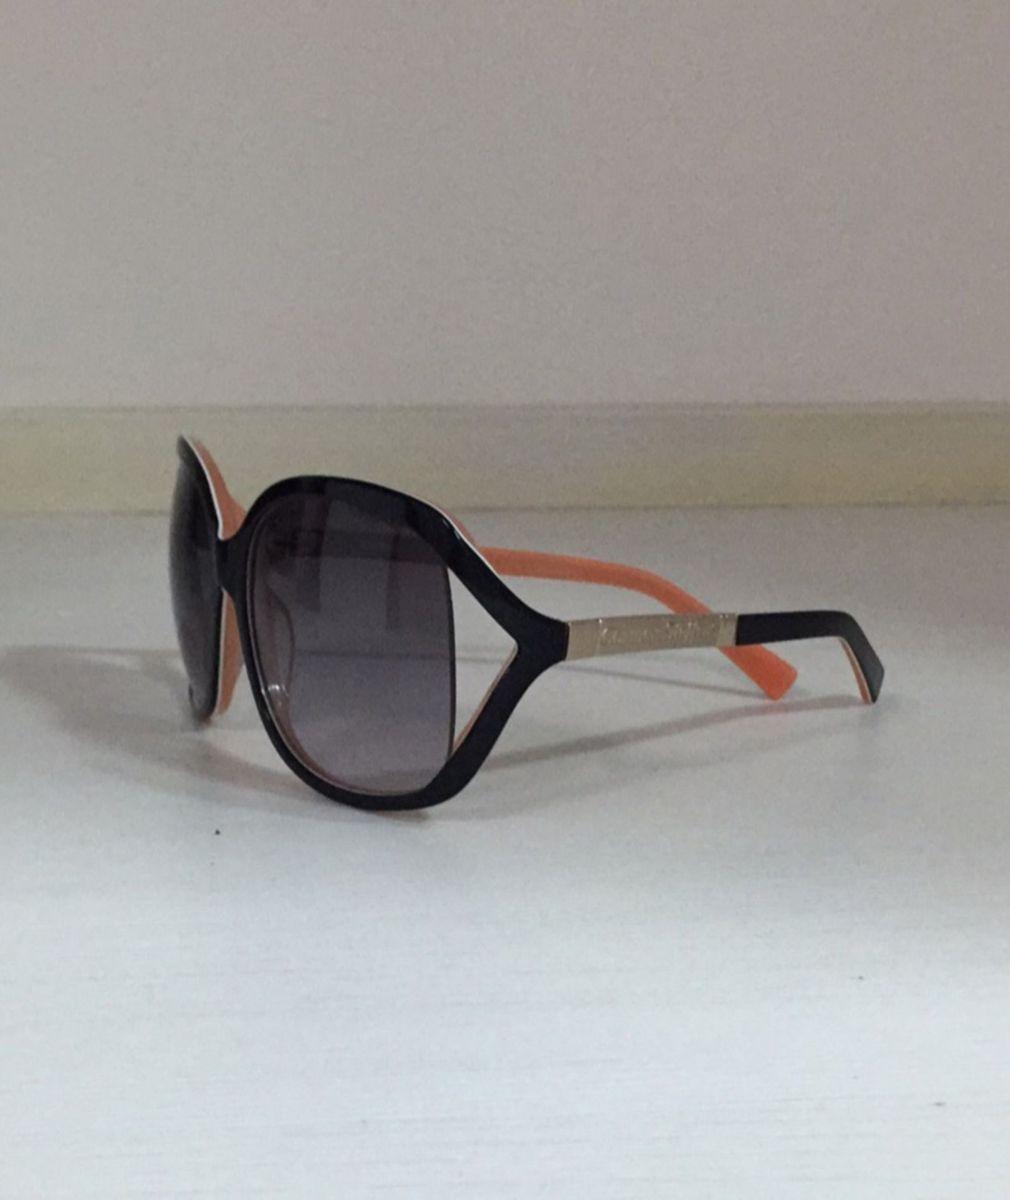 ee8695063ae79 óculos carmen steffens - óculos carmen steffens.  Czm6ly9wag90b3muzw5qb2vplmnvbs5ici9wcm9kdwn0cy81mzuwnjuwl2iyotq5ywy5ndu0y2yyntjlmjjmnmvjndq1njlimgvmlmpwzw  ...